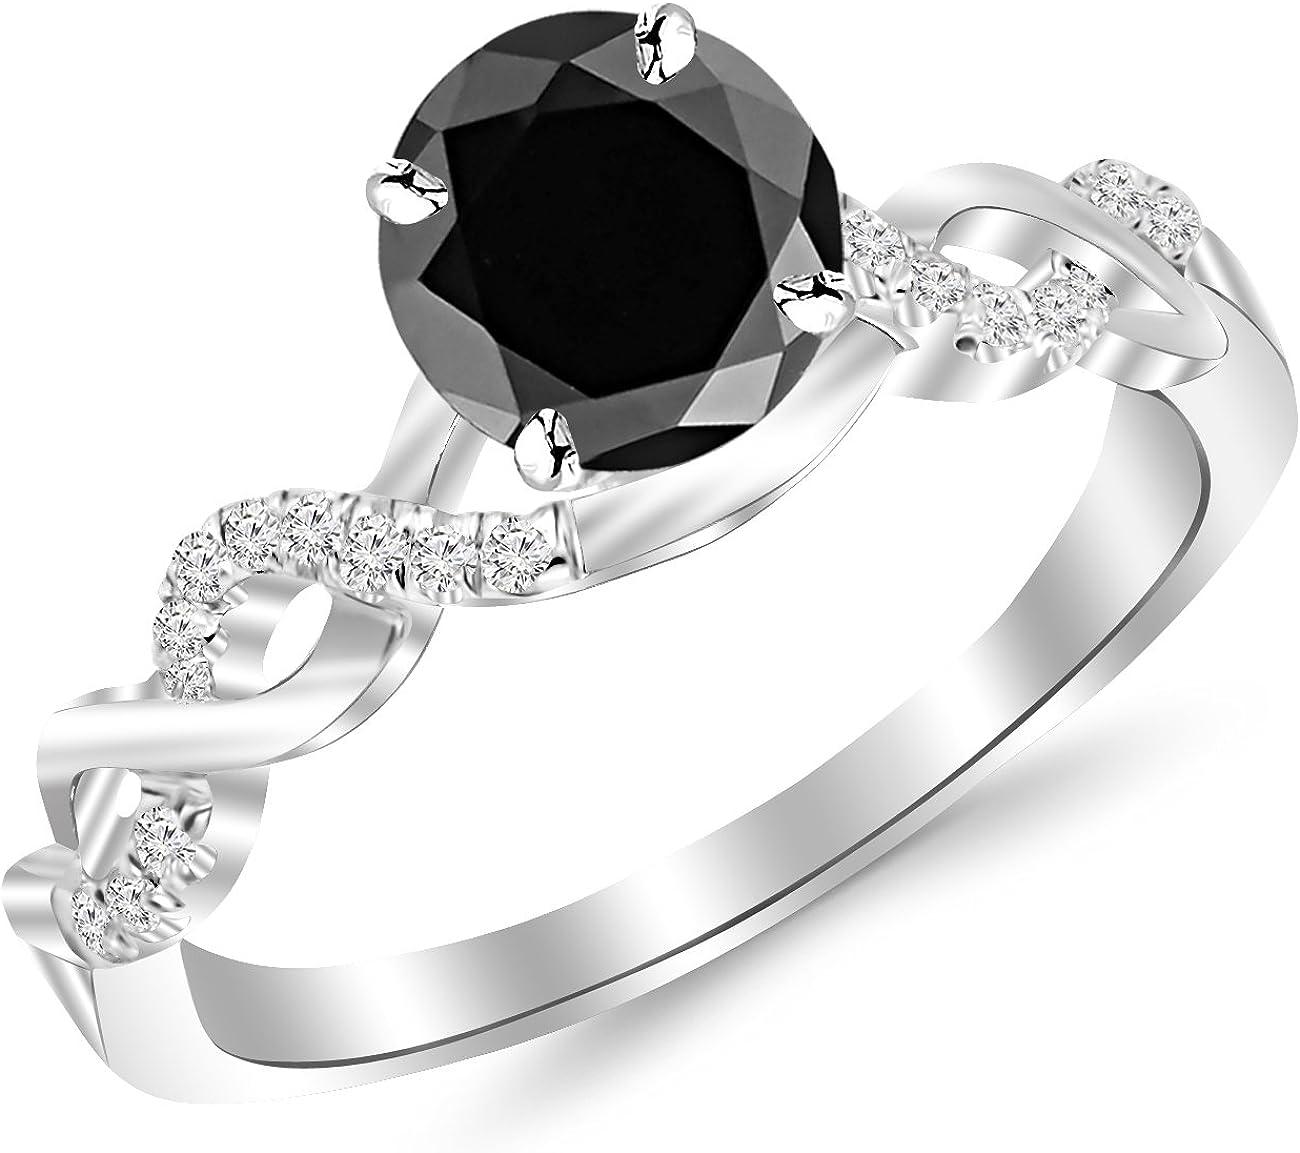 1.13 Carat 14K White Gold Twisting Infinity Gold and Diamond Split Shank Pave Set Diamond Engagement Ring with a 1 Carat Black Diamond Center (Heirloom Quality)